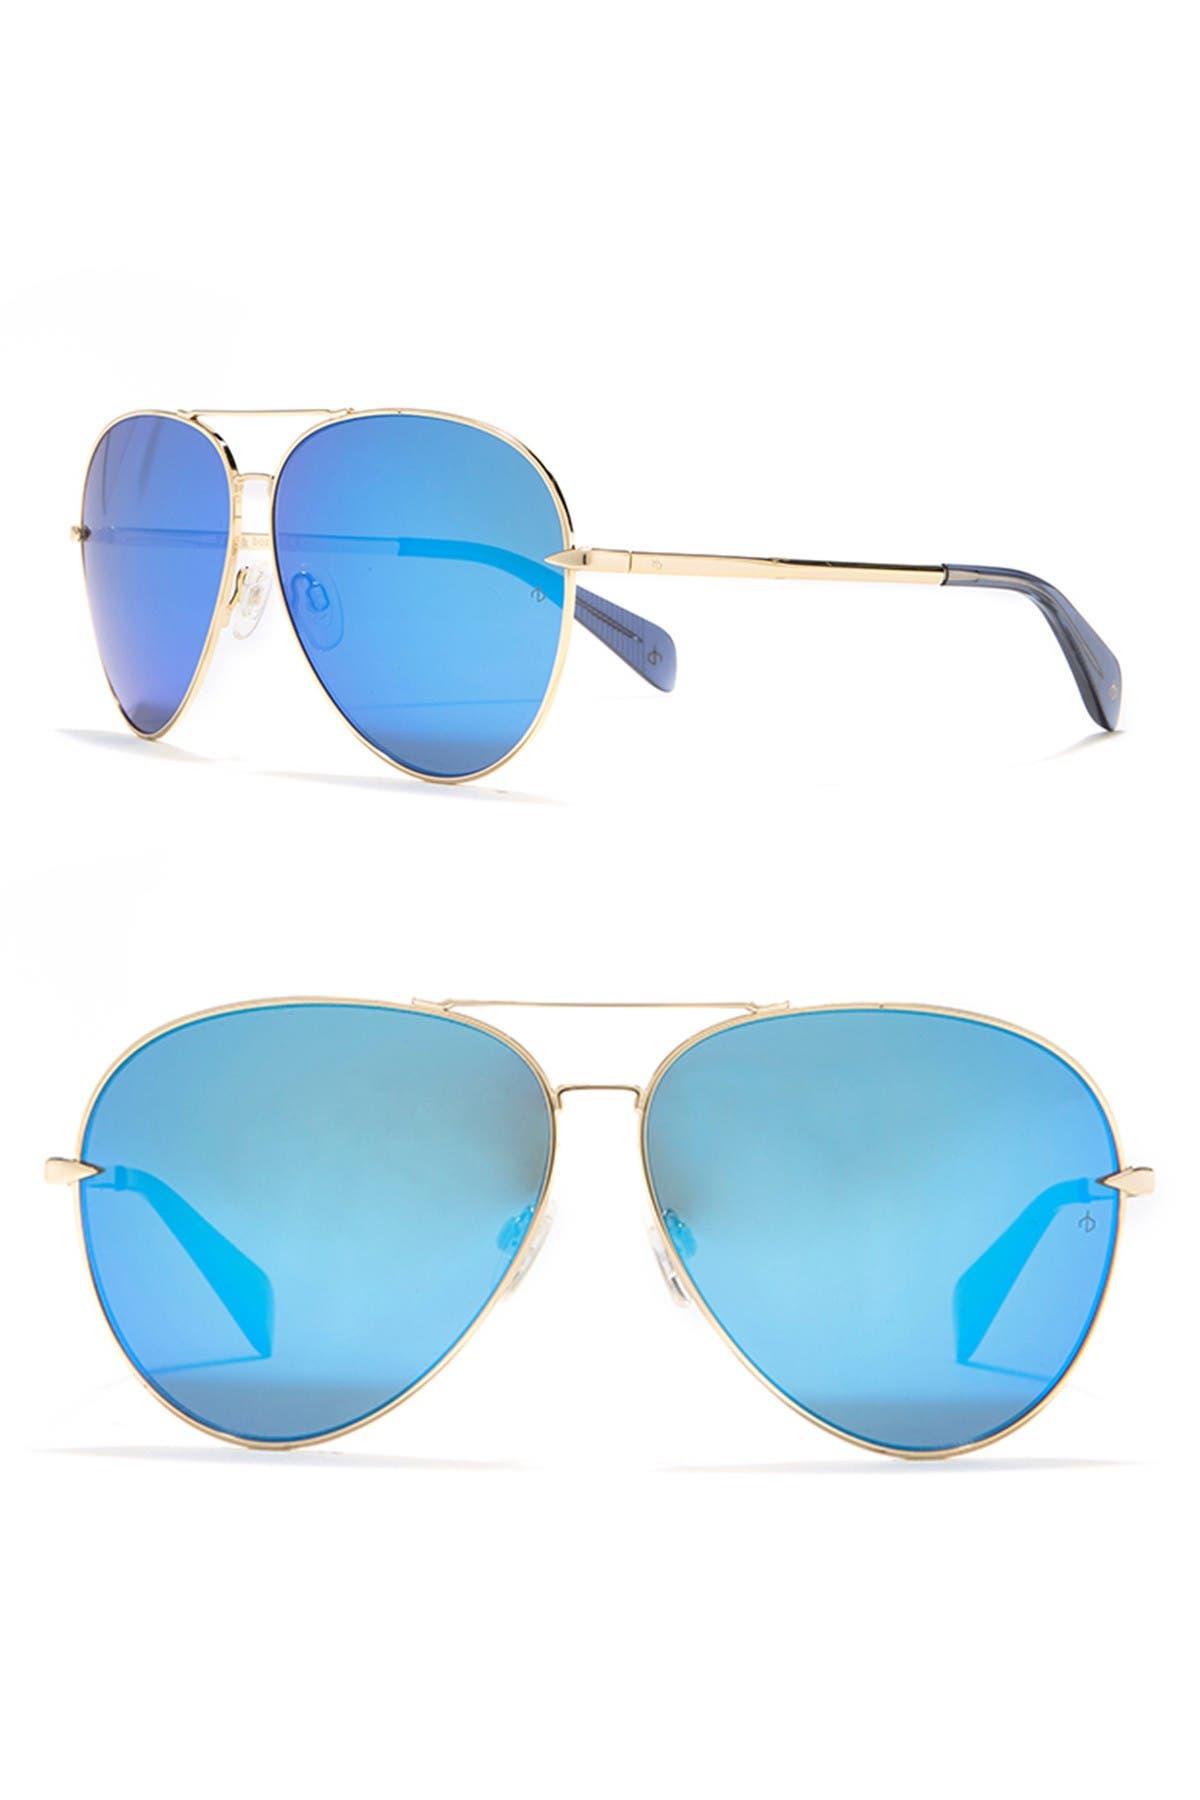 Image of Rag & Bone 62mm Aviator Sunglasses